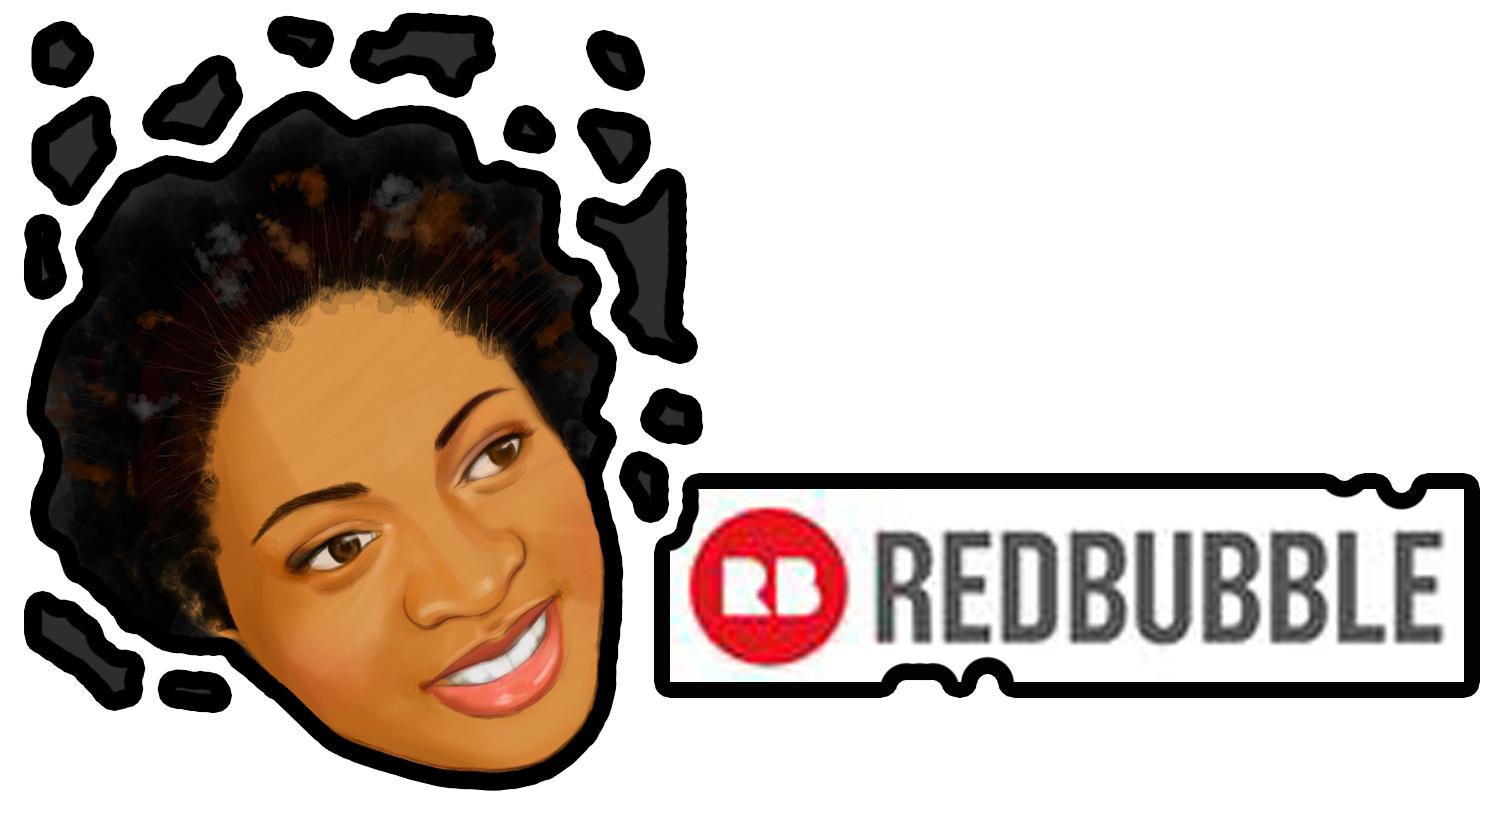 dj-sketch_redbubble